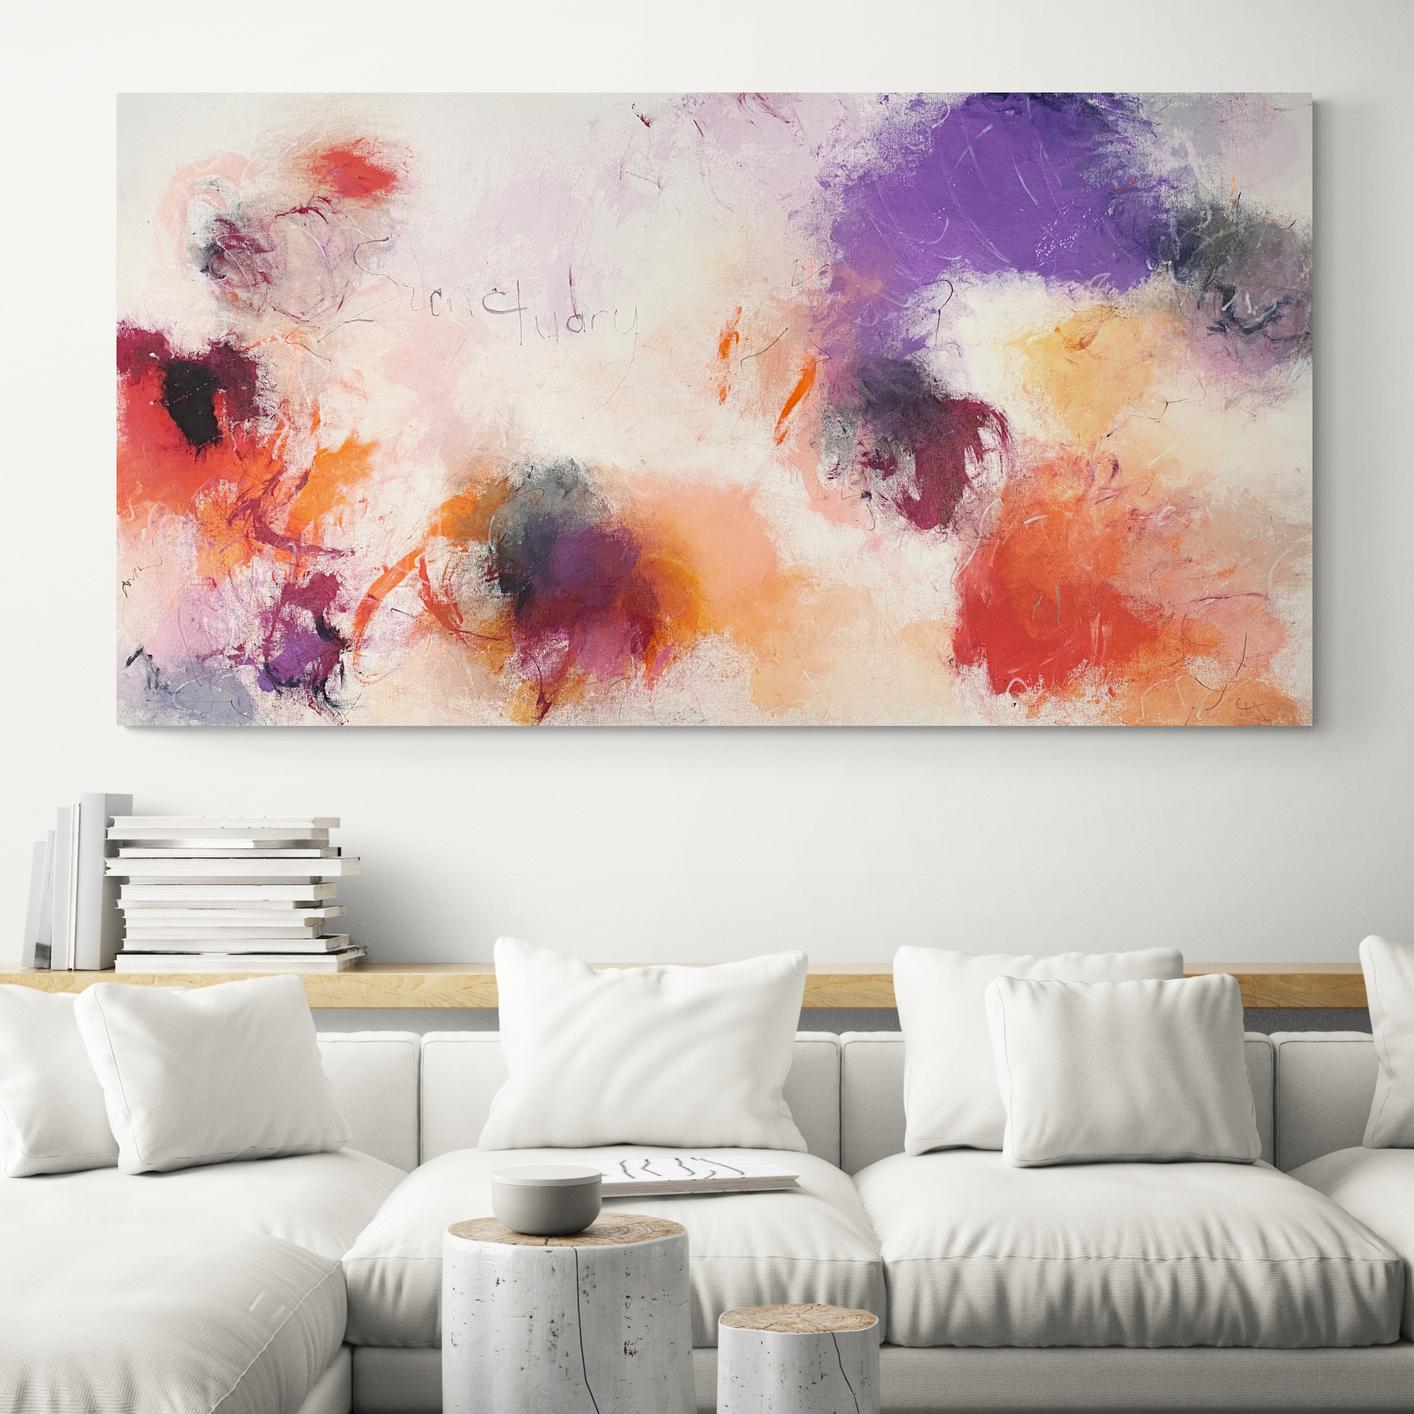 Cheryl Harrison Artist - Large Wall Art